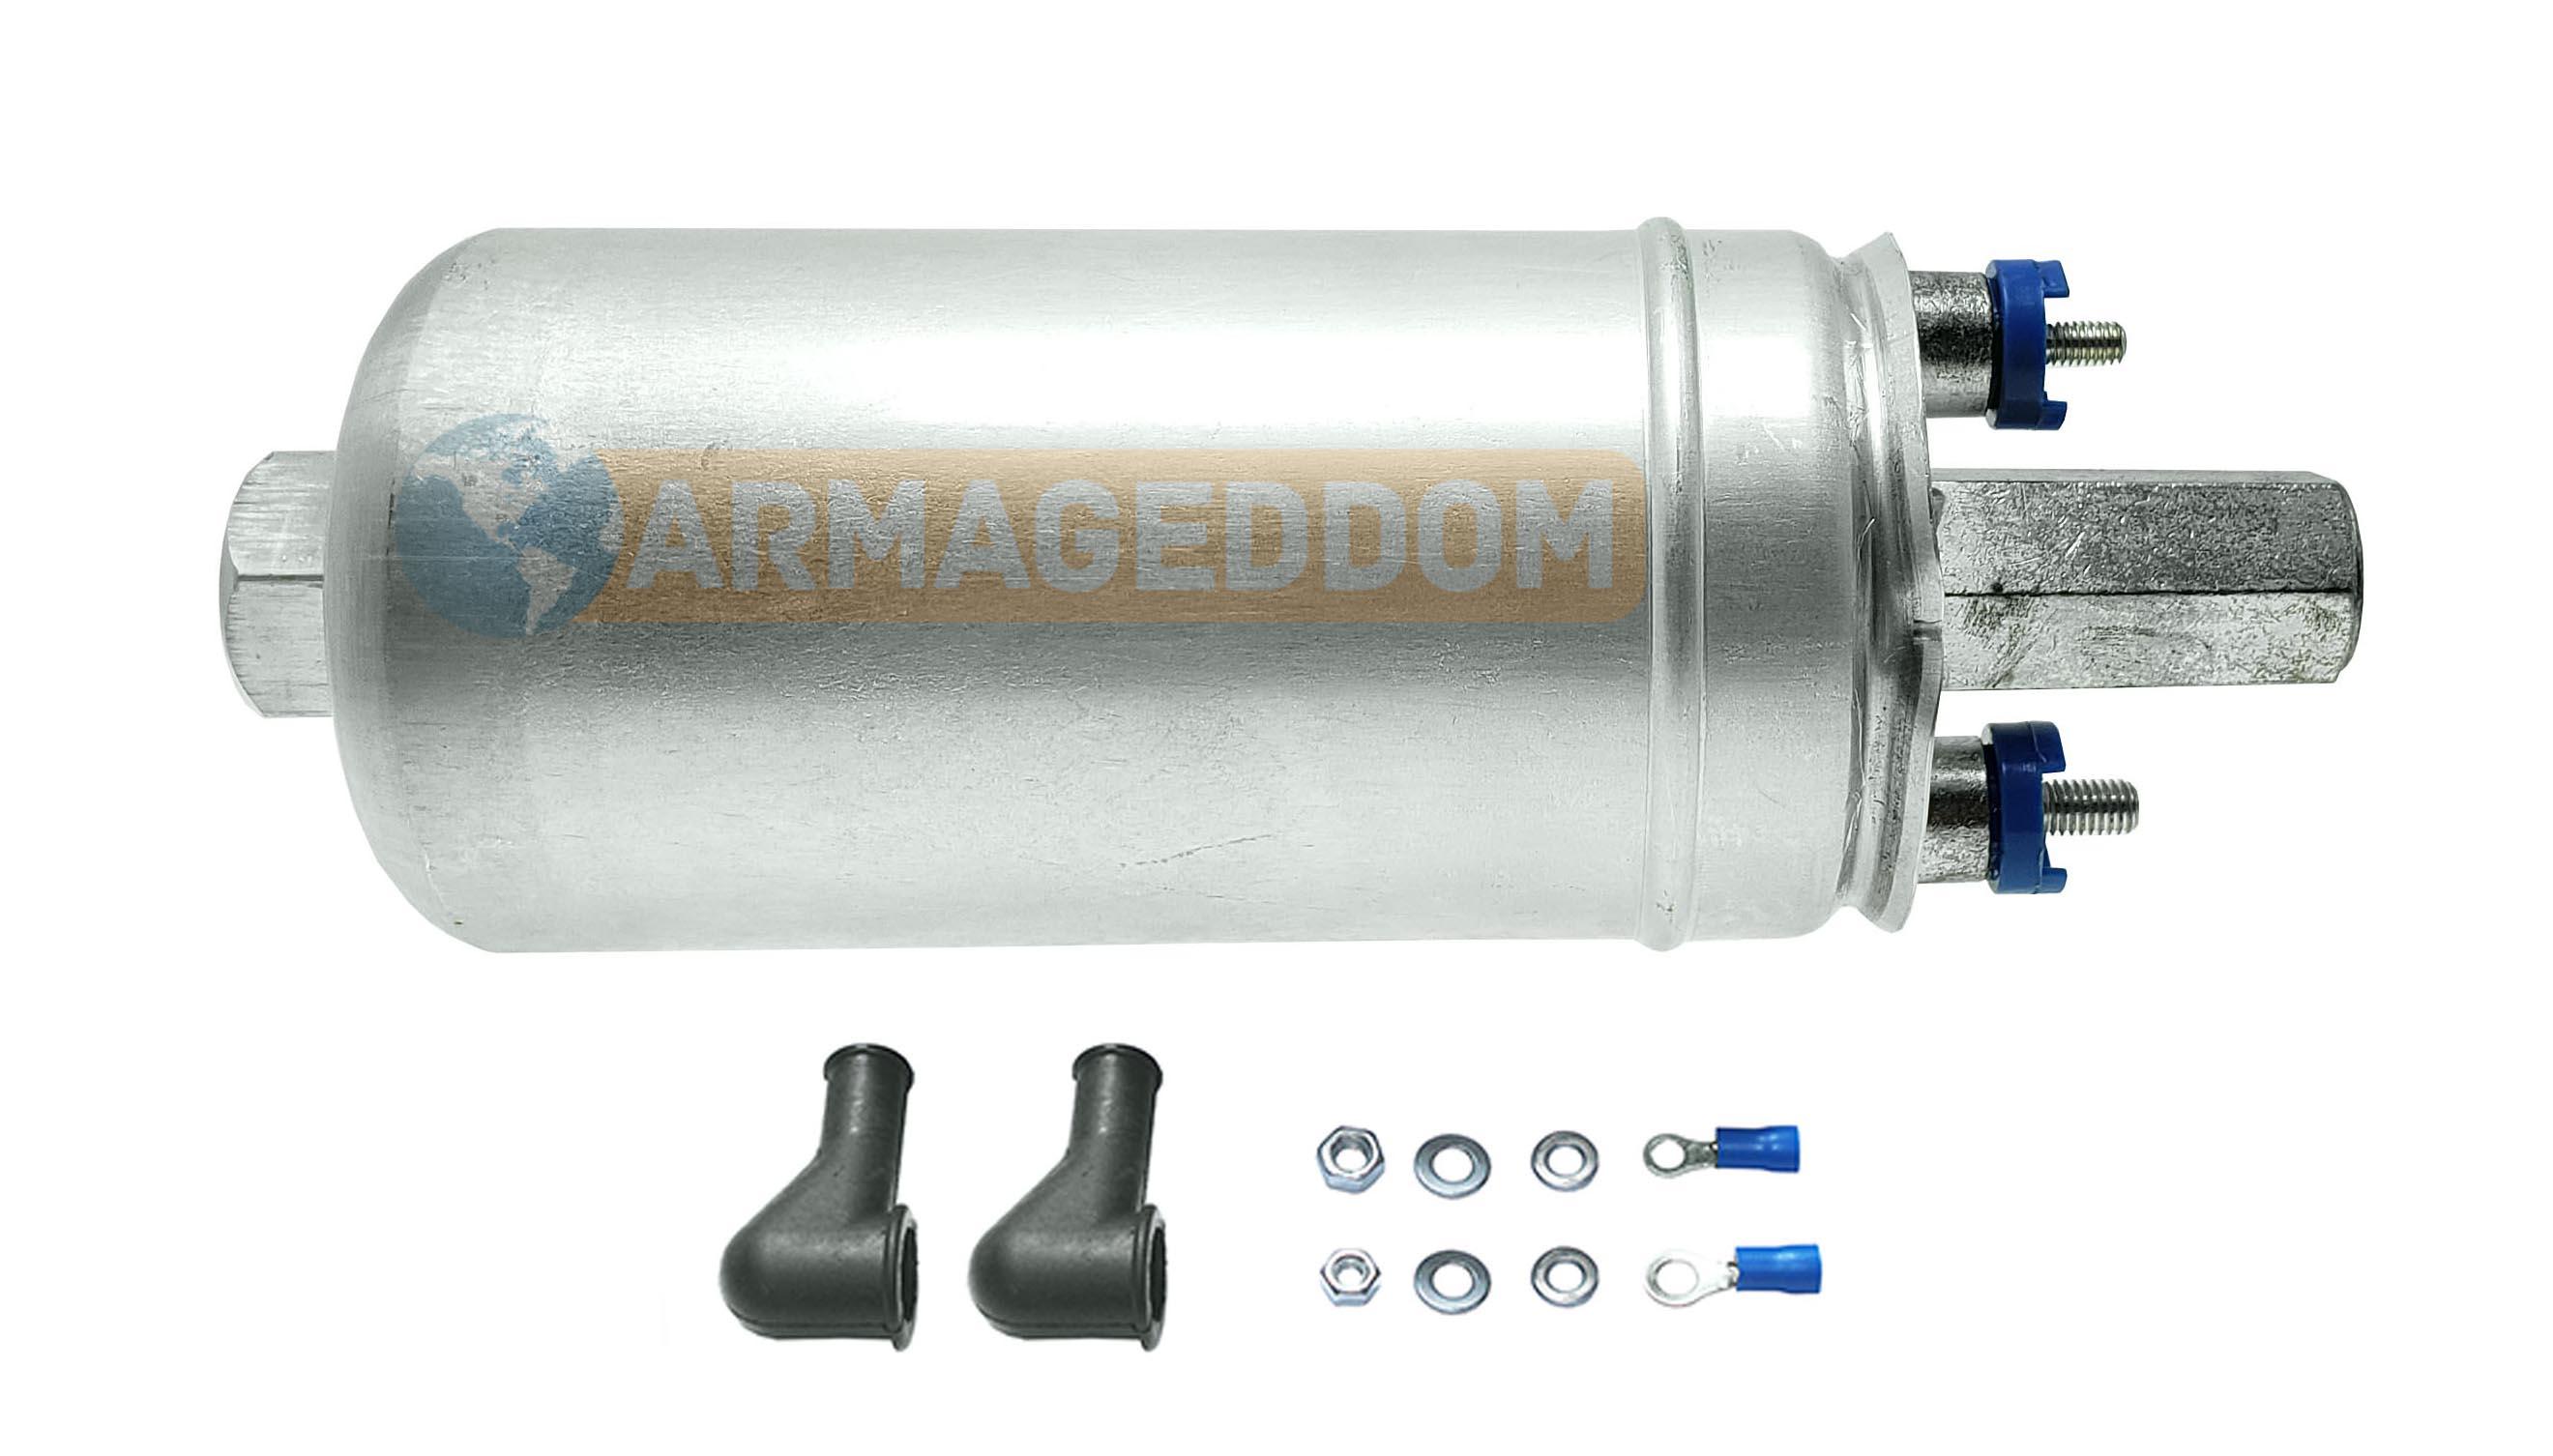 Bomba De Combustivel Tipo Bosch 044 Gasolina Álcool Flex